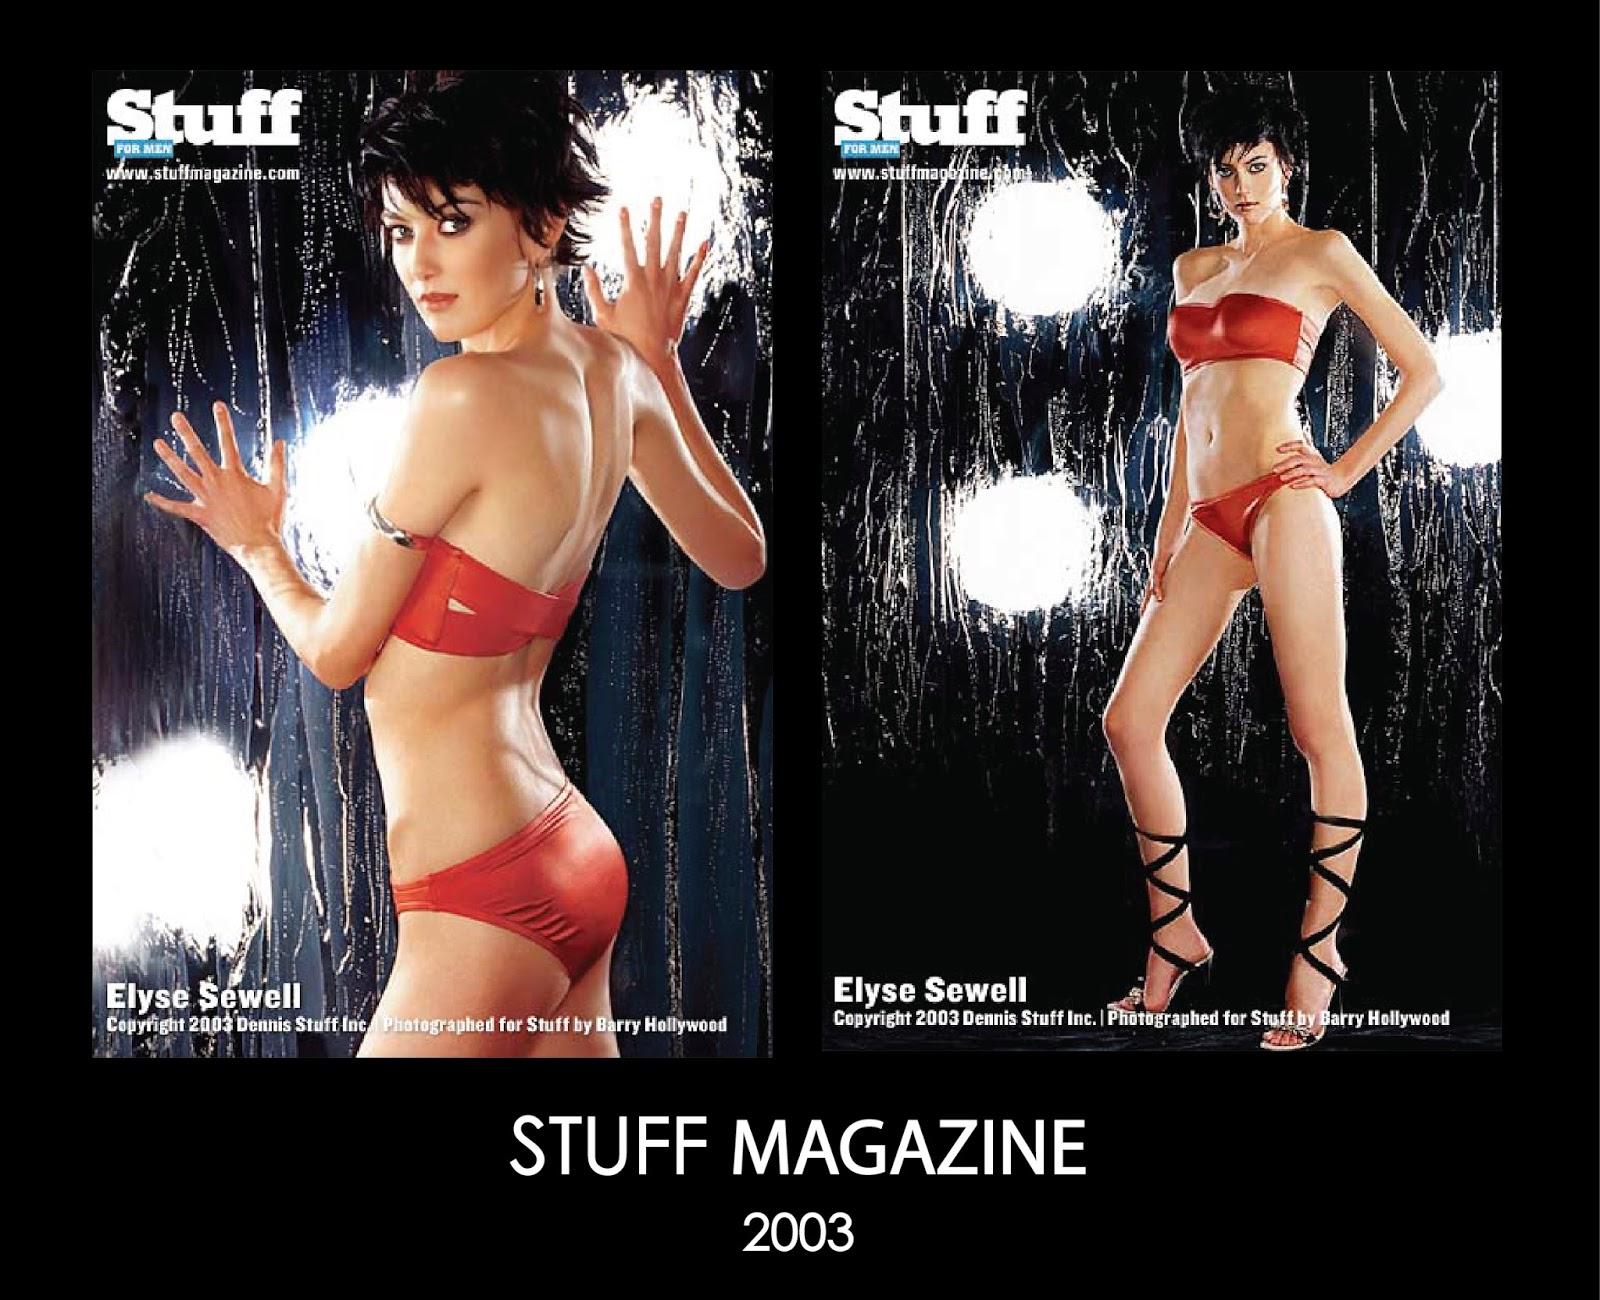 Elyse sewell nude Nude Photos 27